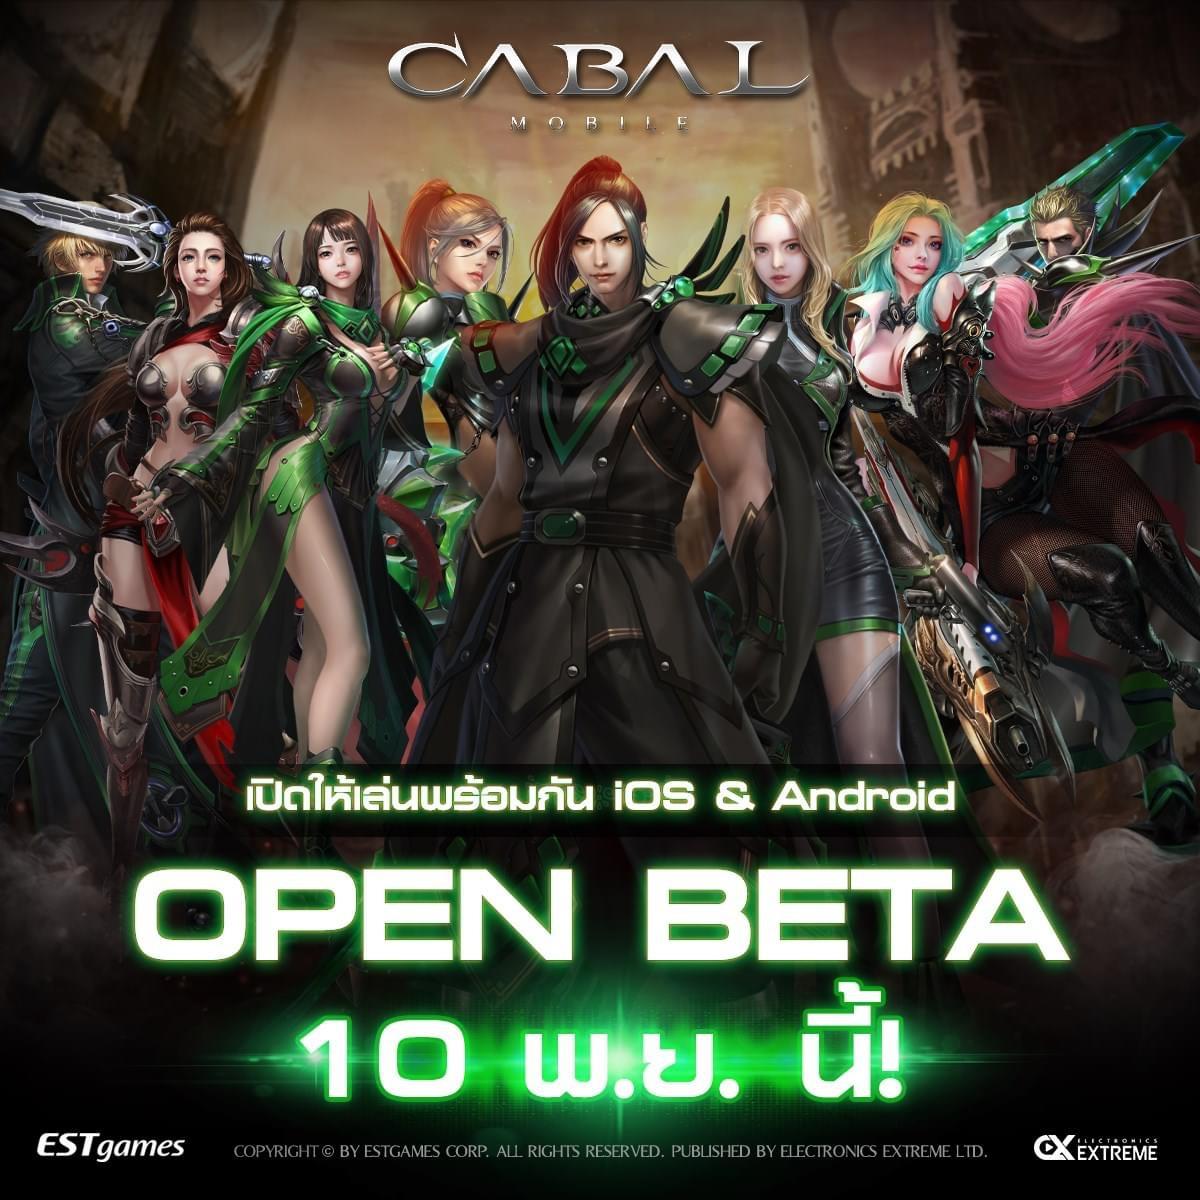 Cabal Mobile Thailand Open Beta pada 10 November 2020